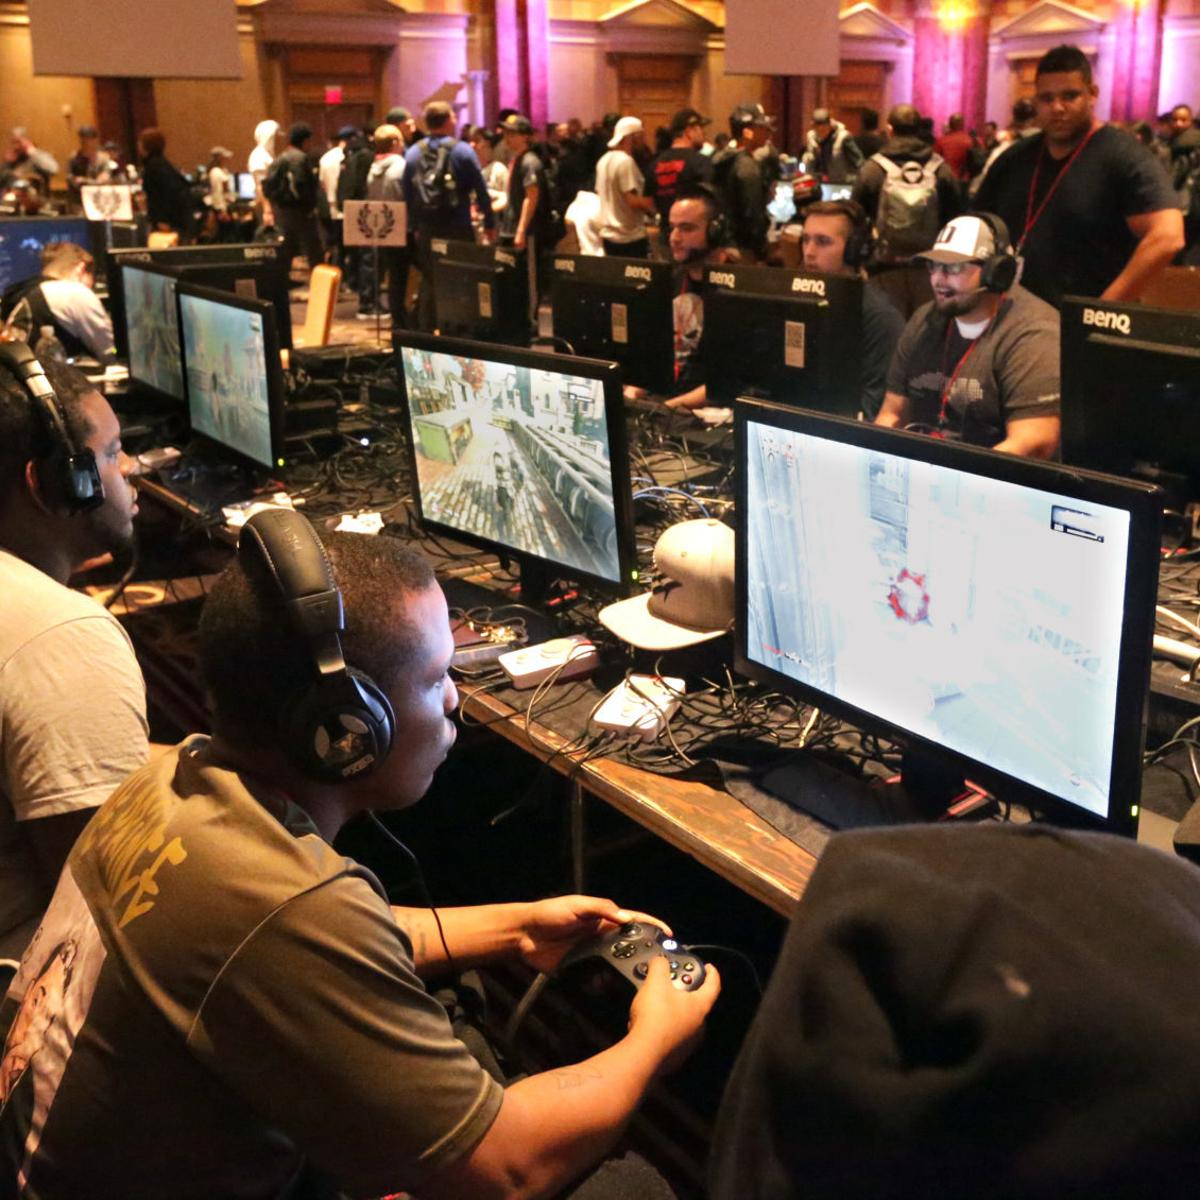 Atlantic City to host esports event summit | Business